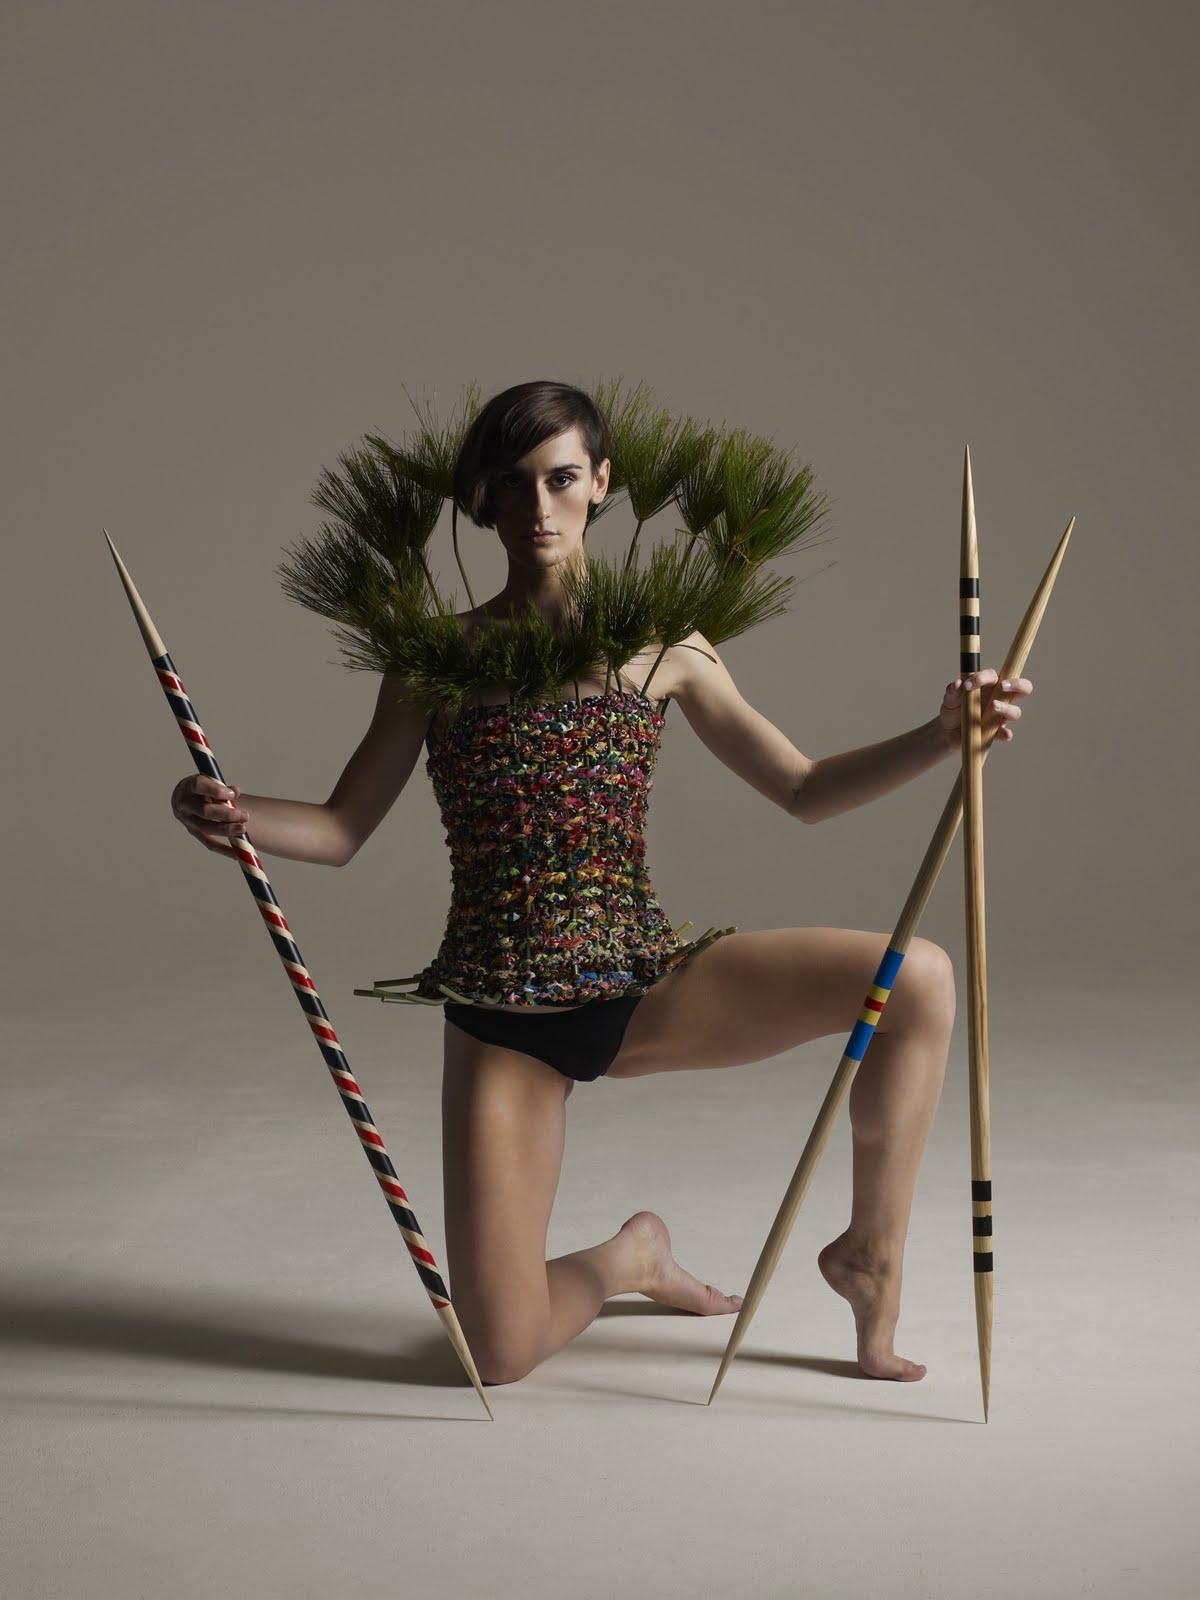 http://3.bp.blogspot.com/-88nmrz6qHSE/Ti2YvByi_fI/AAAAAAAABLk/LJLU9_4a7q4/s1600/Yelle+papyrus+with+sticks+%2528C%2529+GREGOIRE+ALEXANDRE.jpg